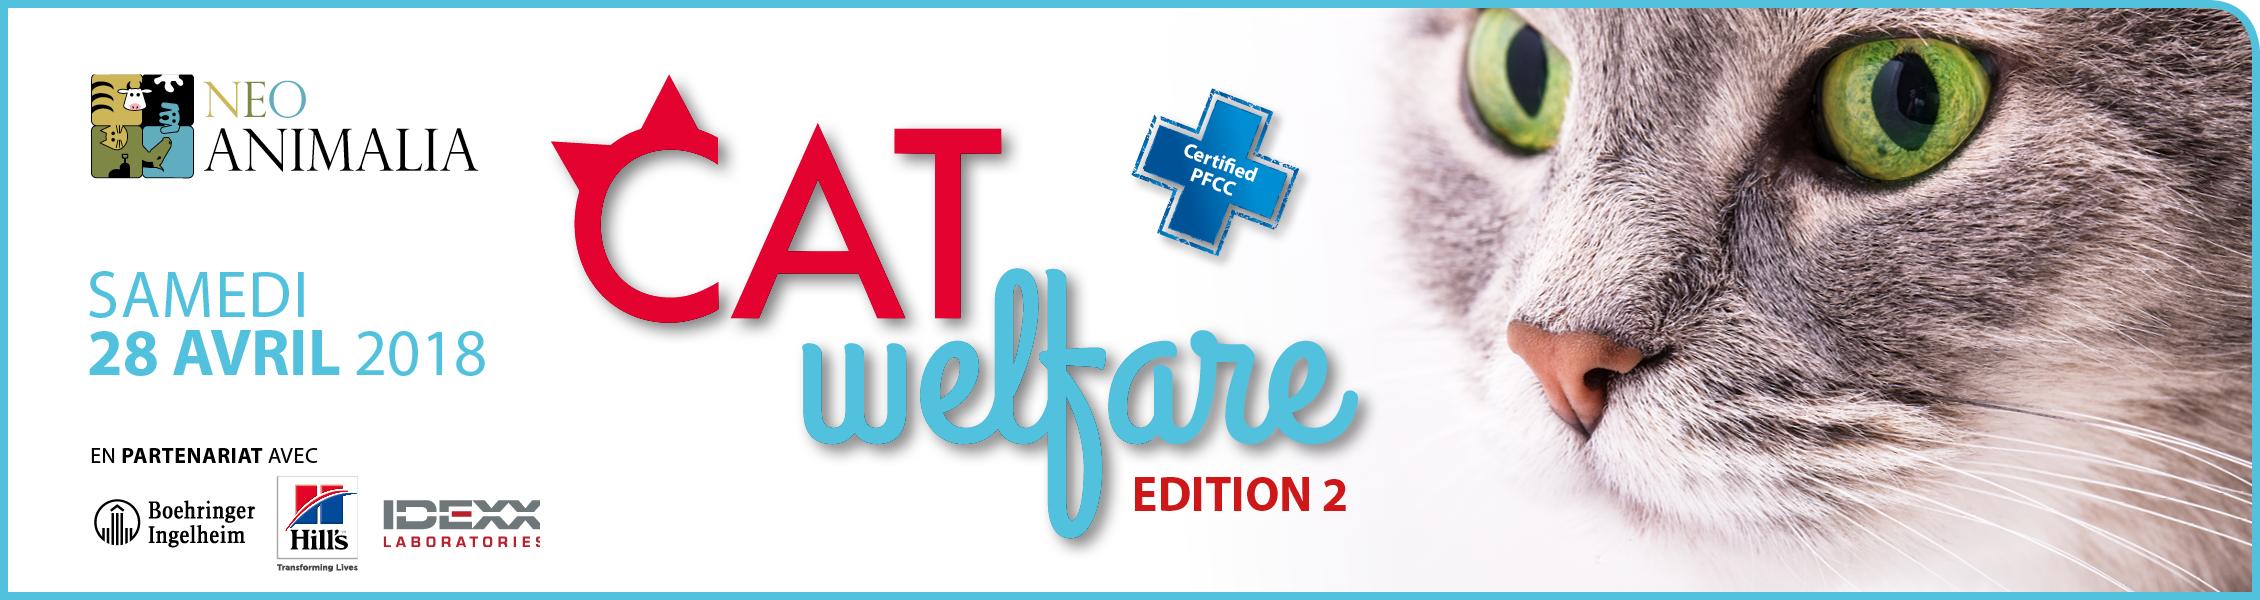 CAT Welfare Édition 2 FR